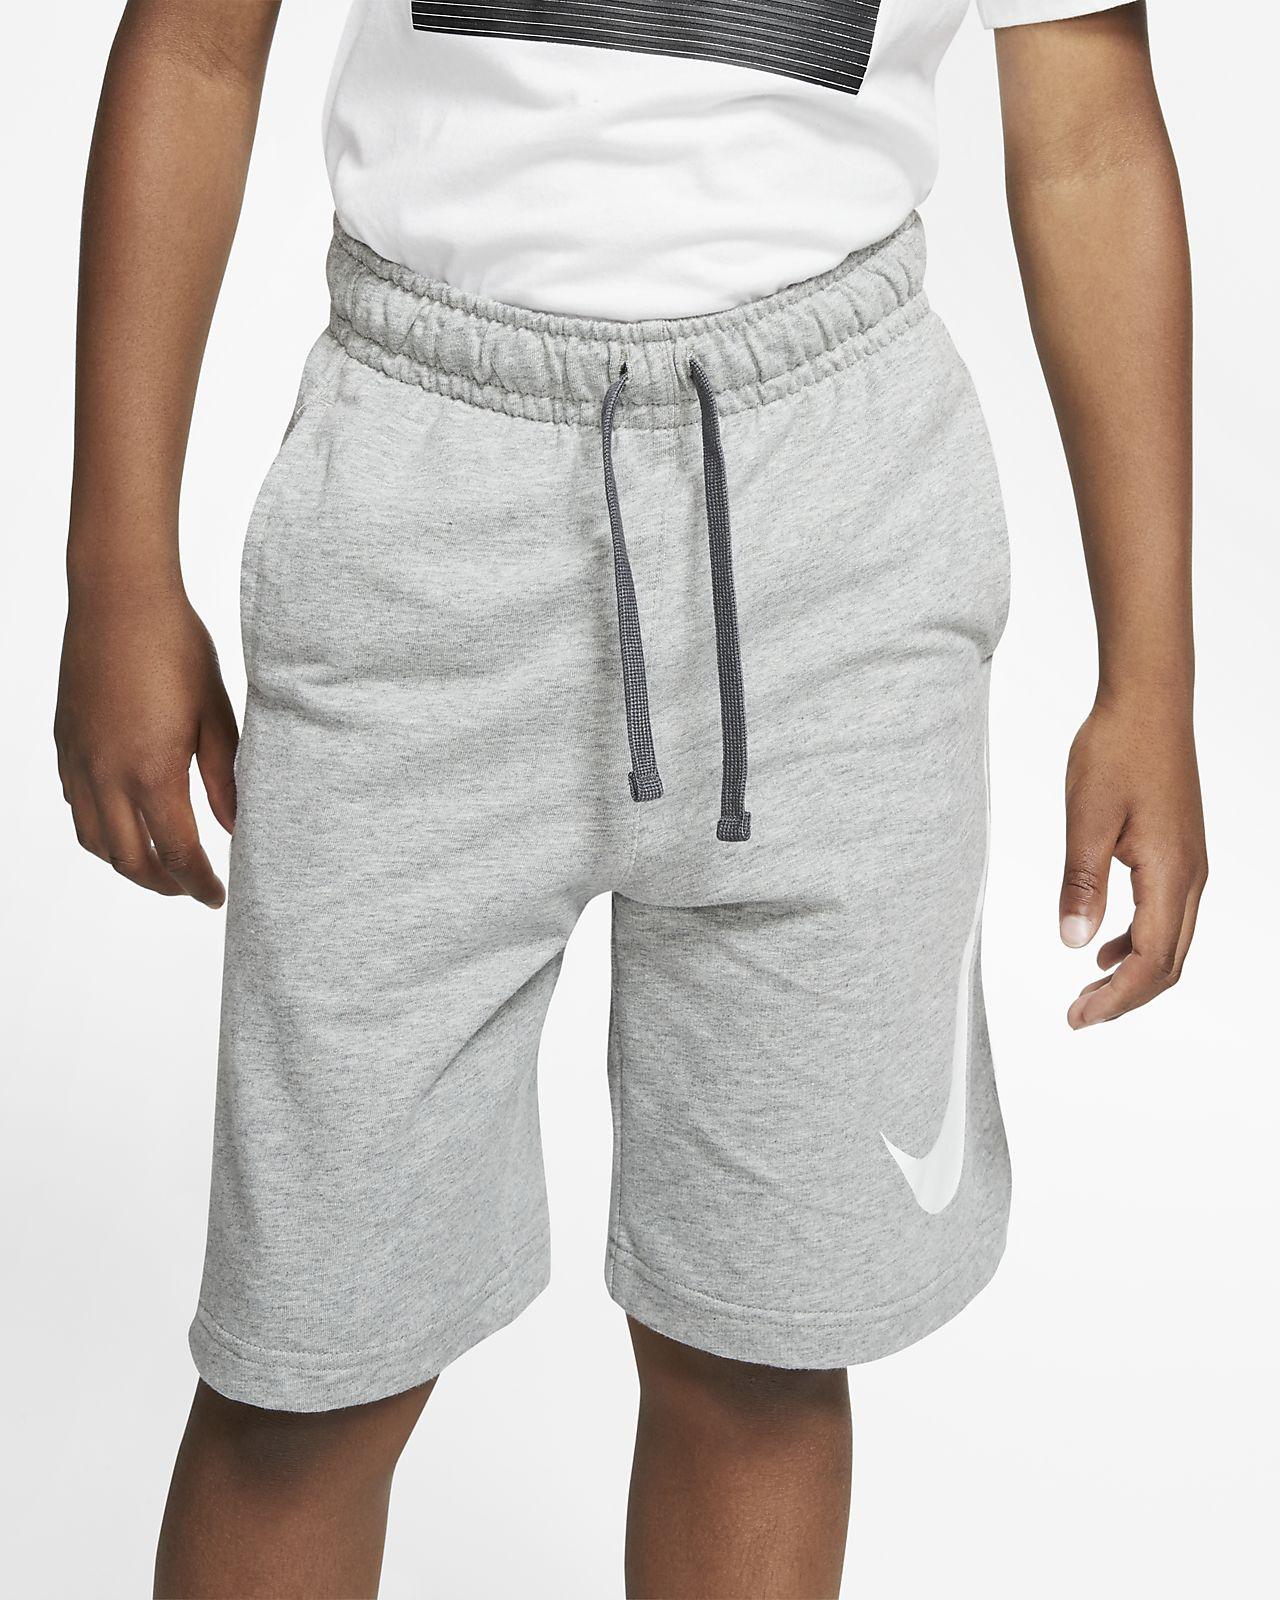 Shorts in French Terry Nike Sportswear - Bambino/Ragazzo